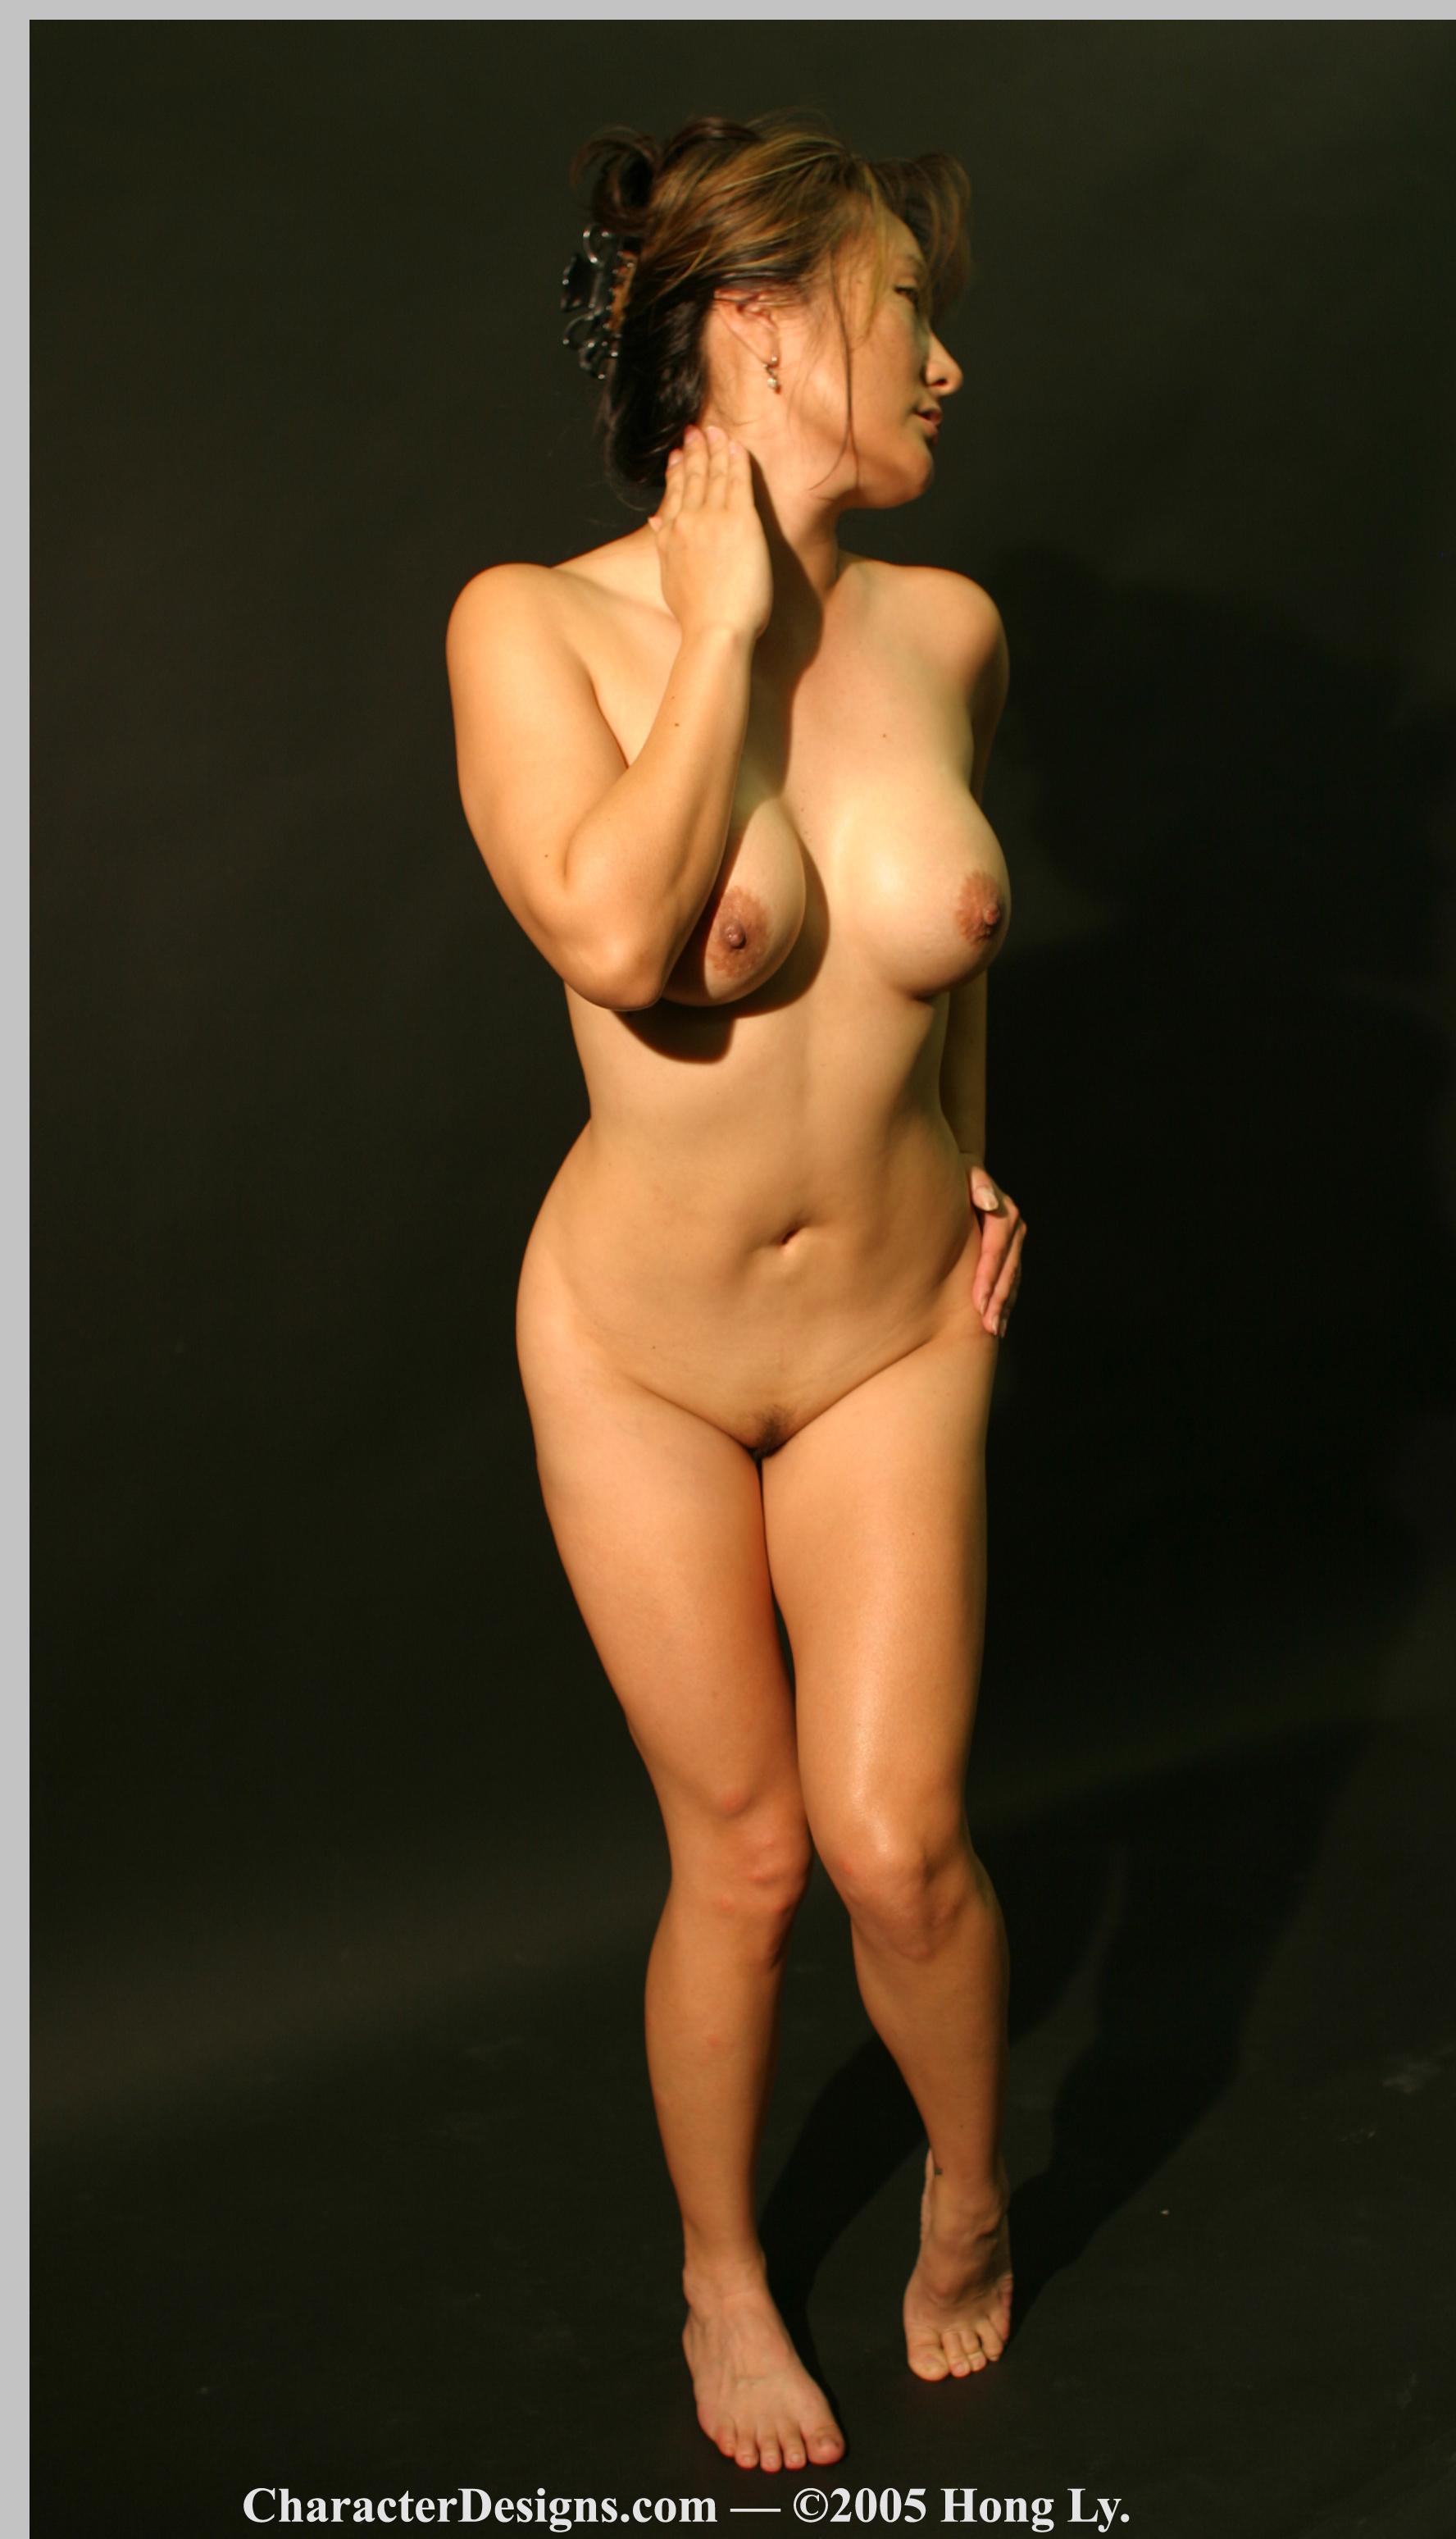 figure_000_0003.JPG